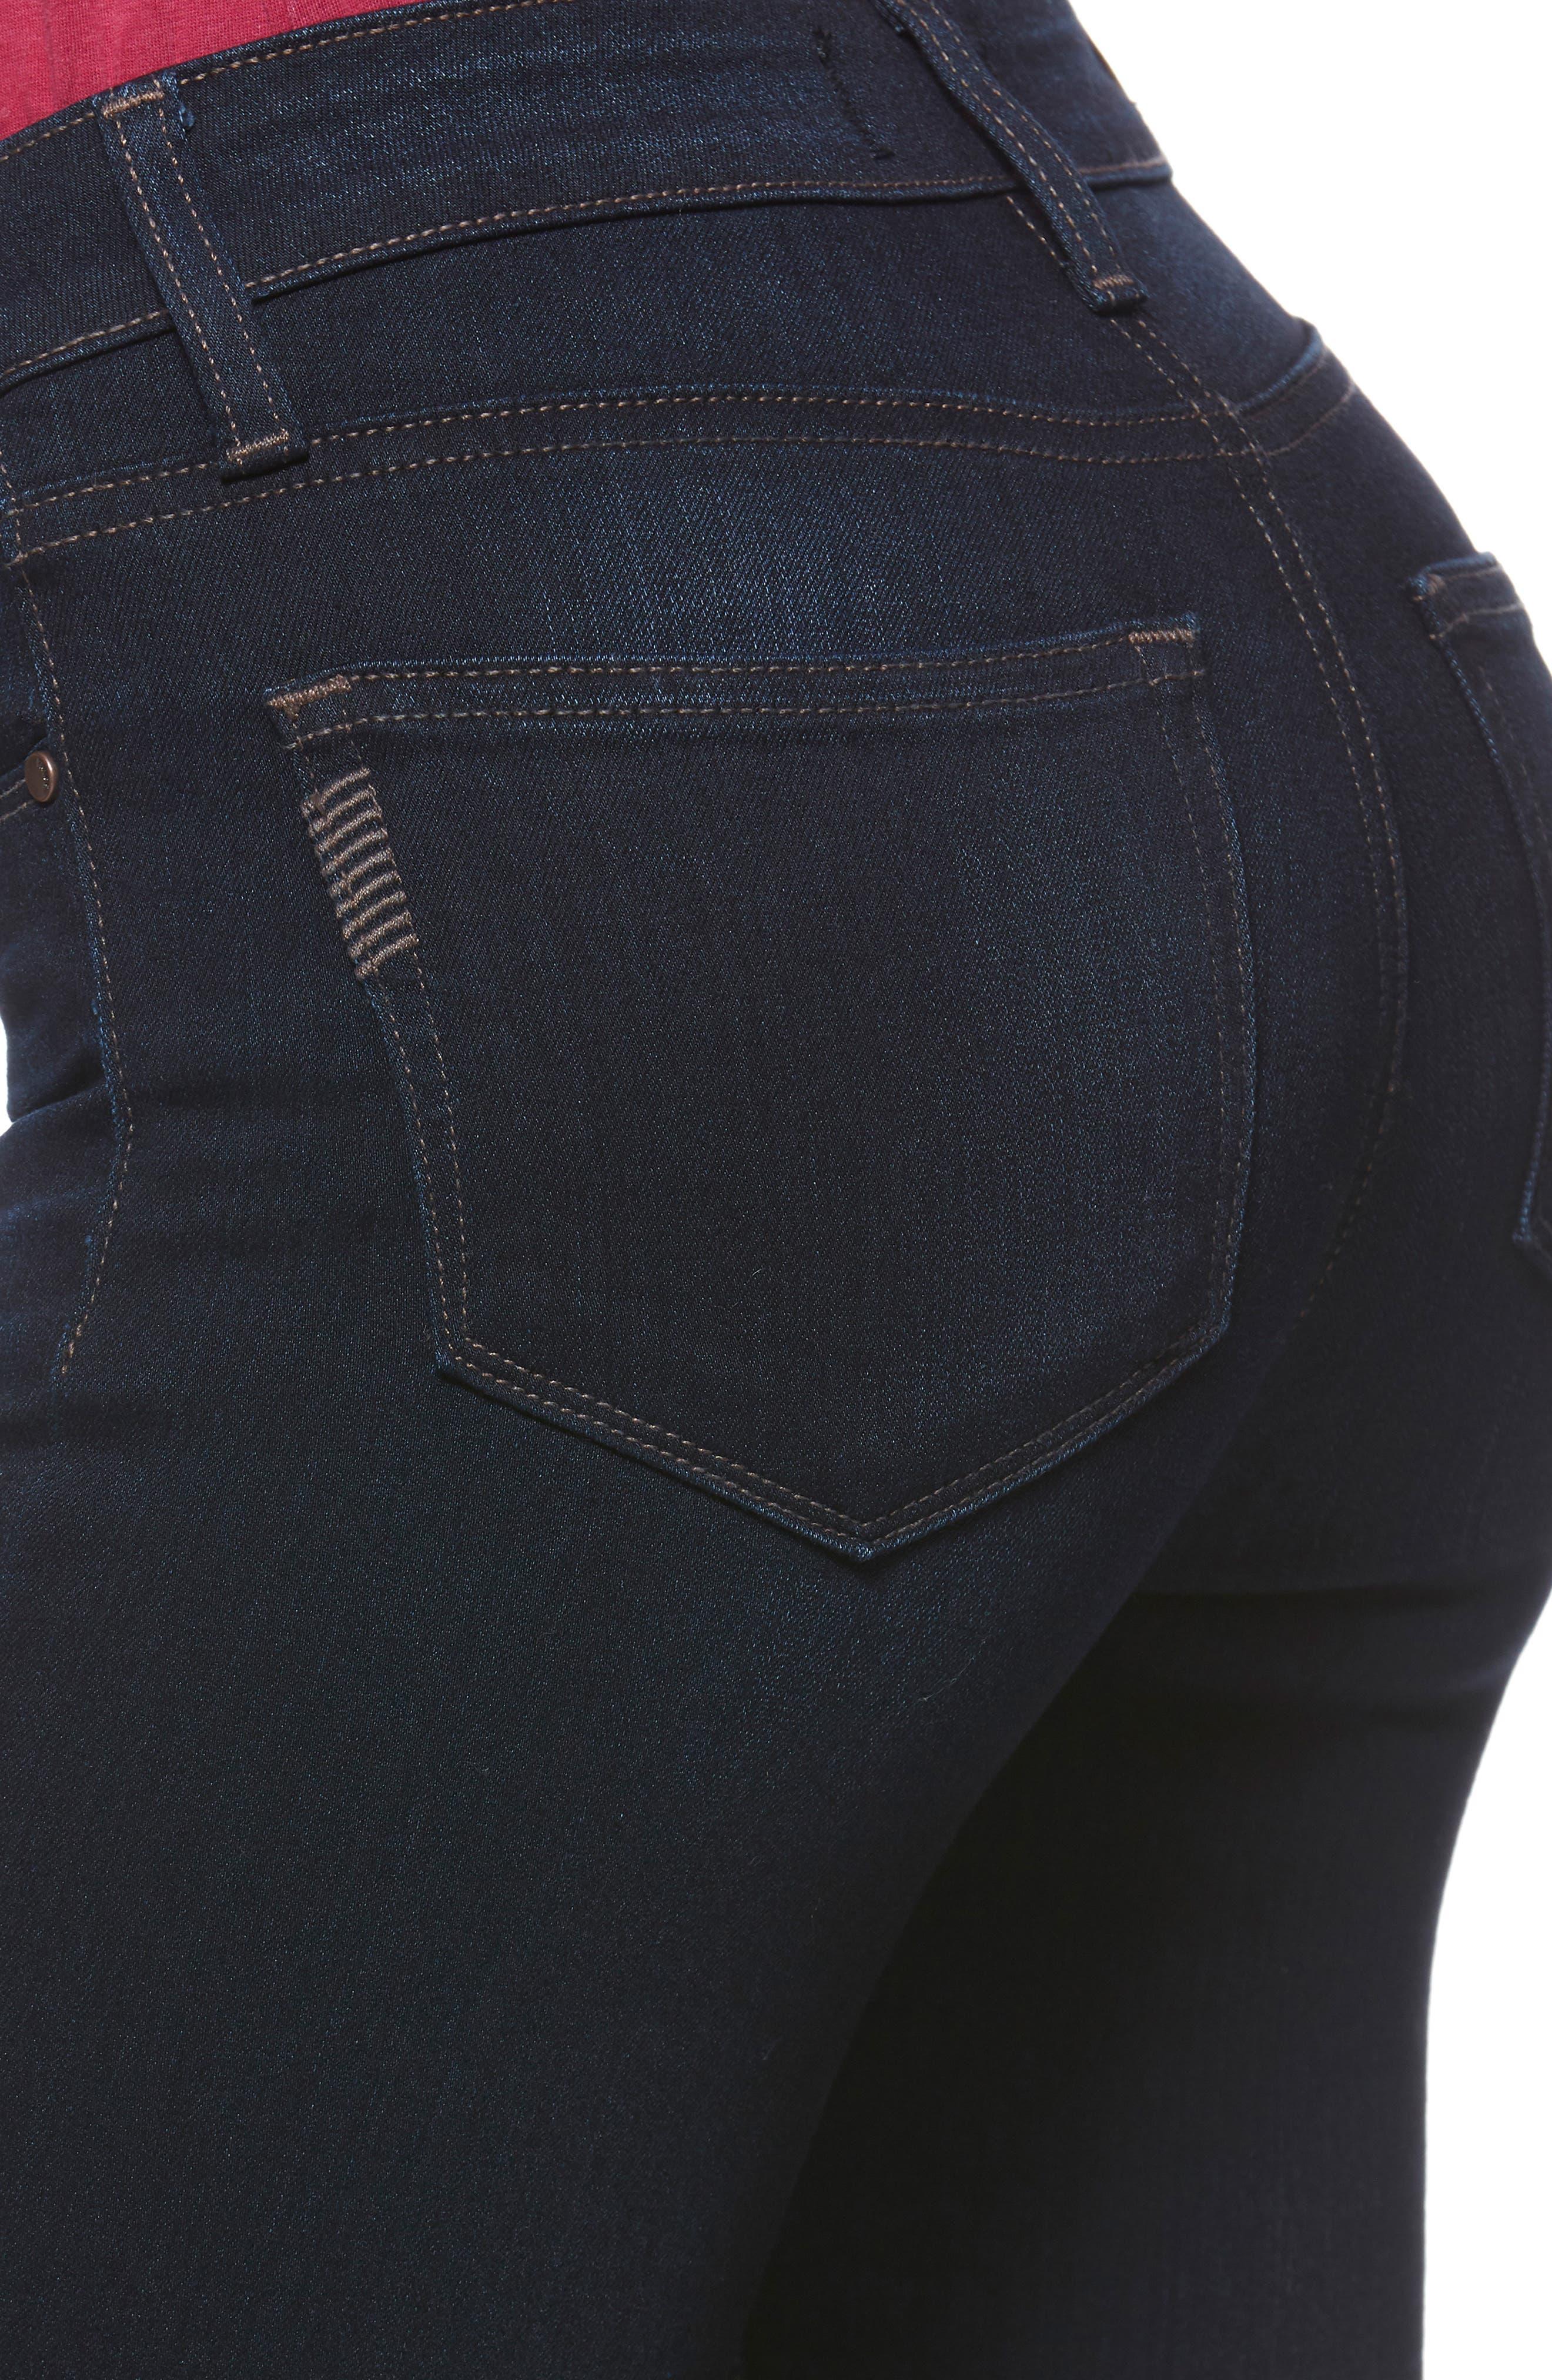 Transcend - Verdugo Ankle Skinny Jeans,                             Alternate thumbnail 4, color,                             400